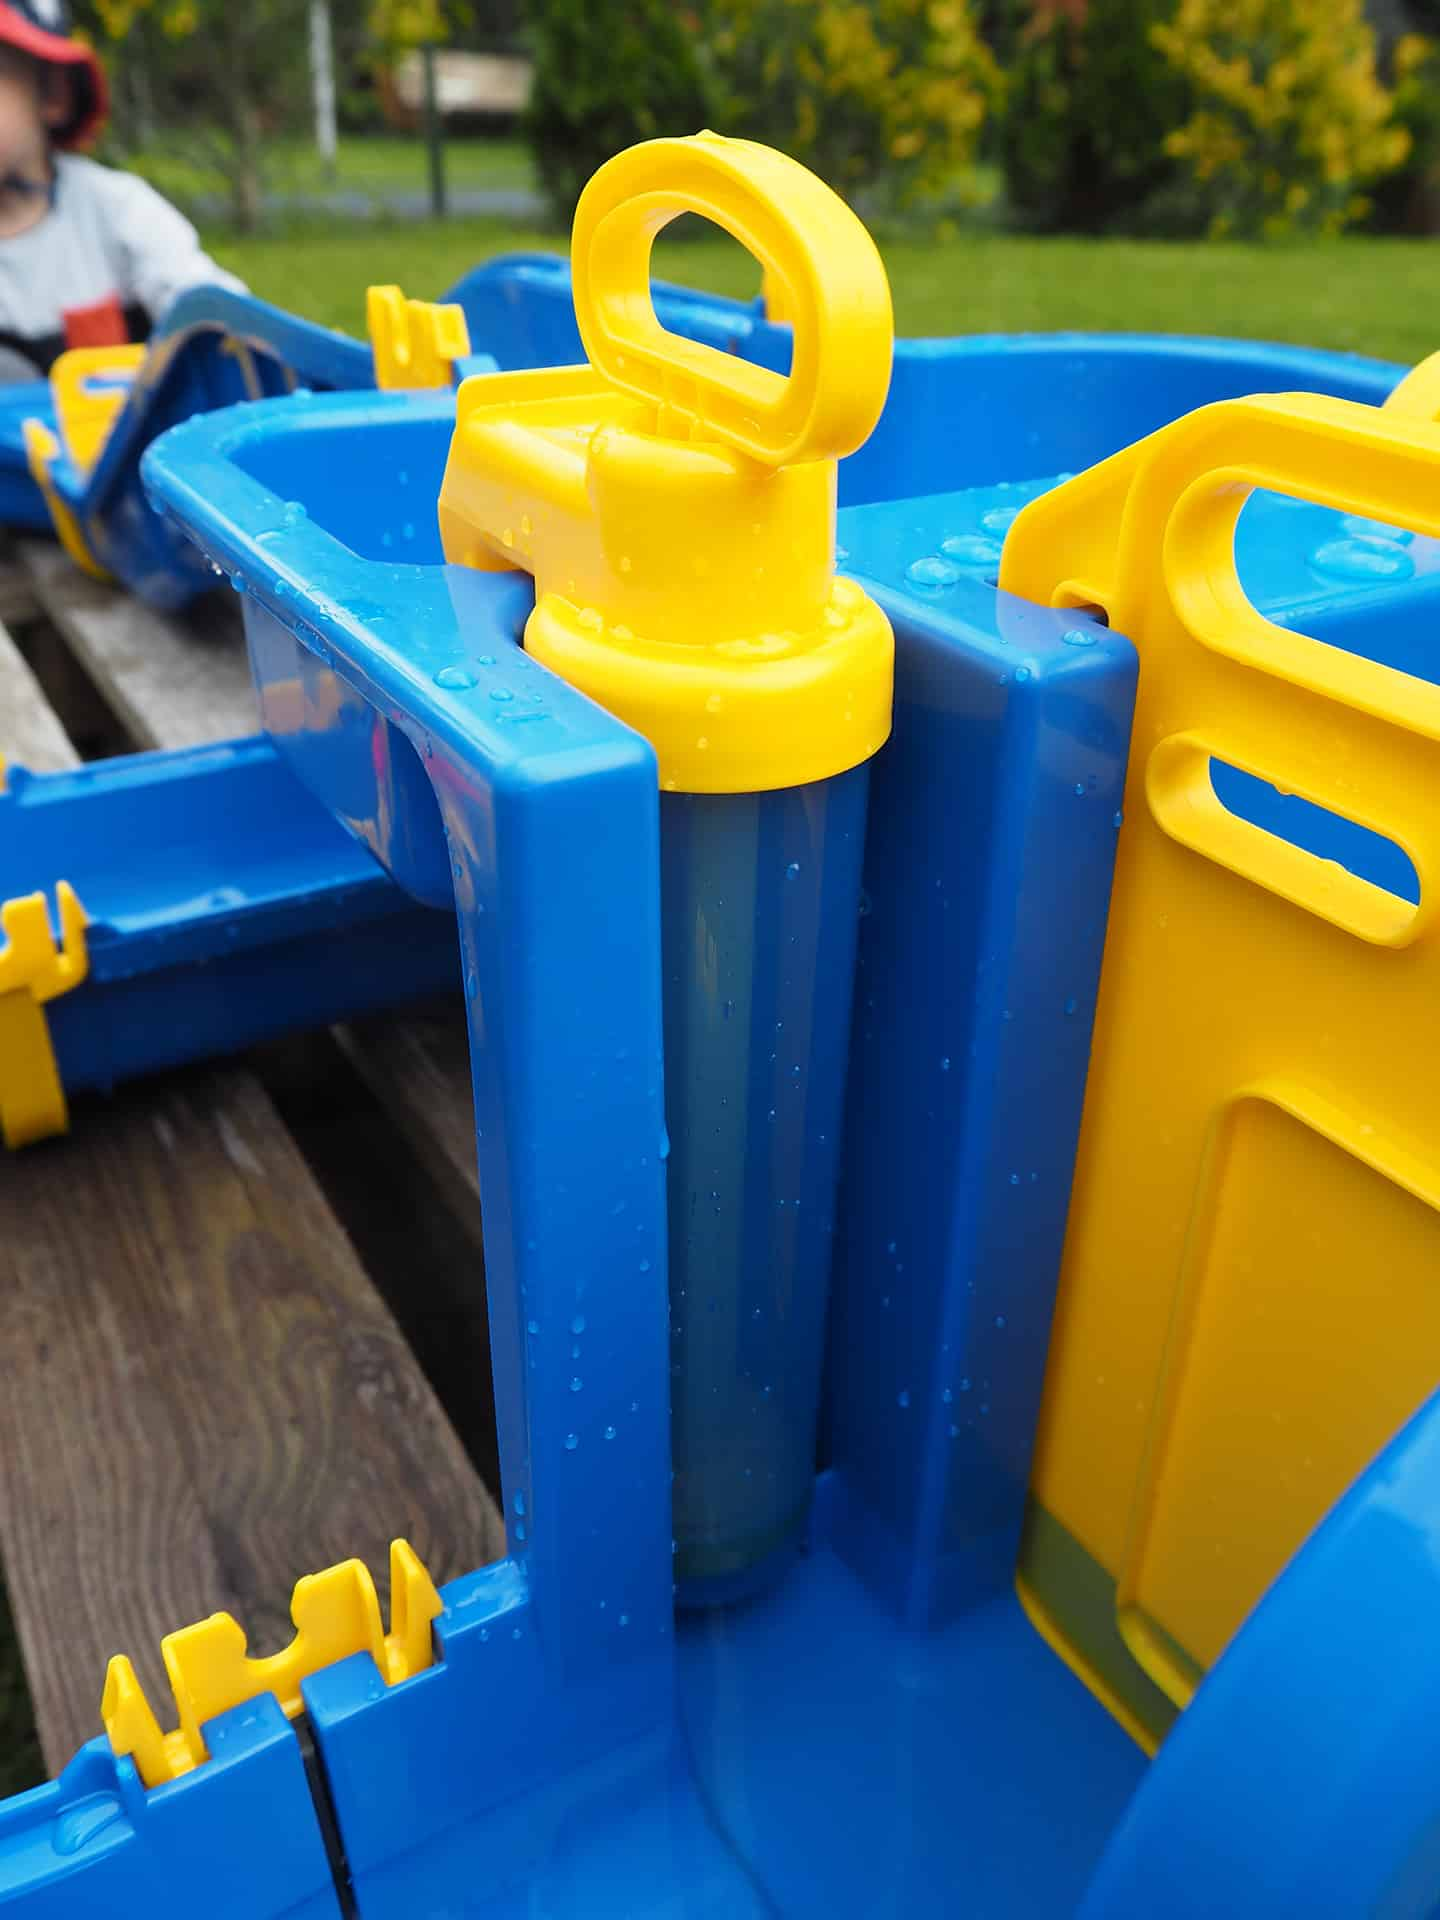 BIG Waterplay (Niagara) Wasserbahn im Test | ツ PapaTestet